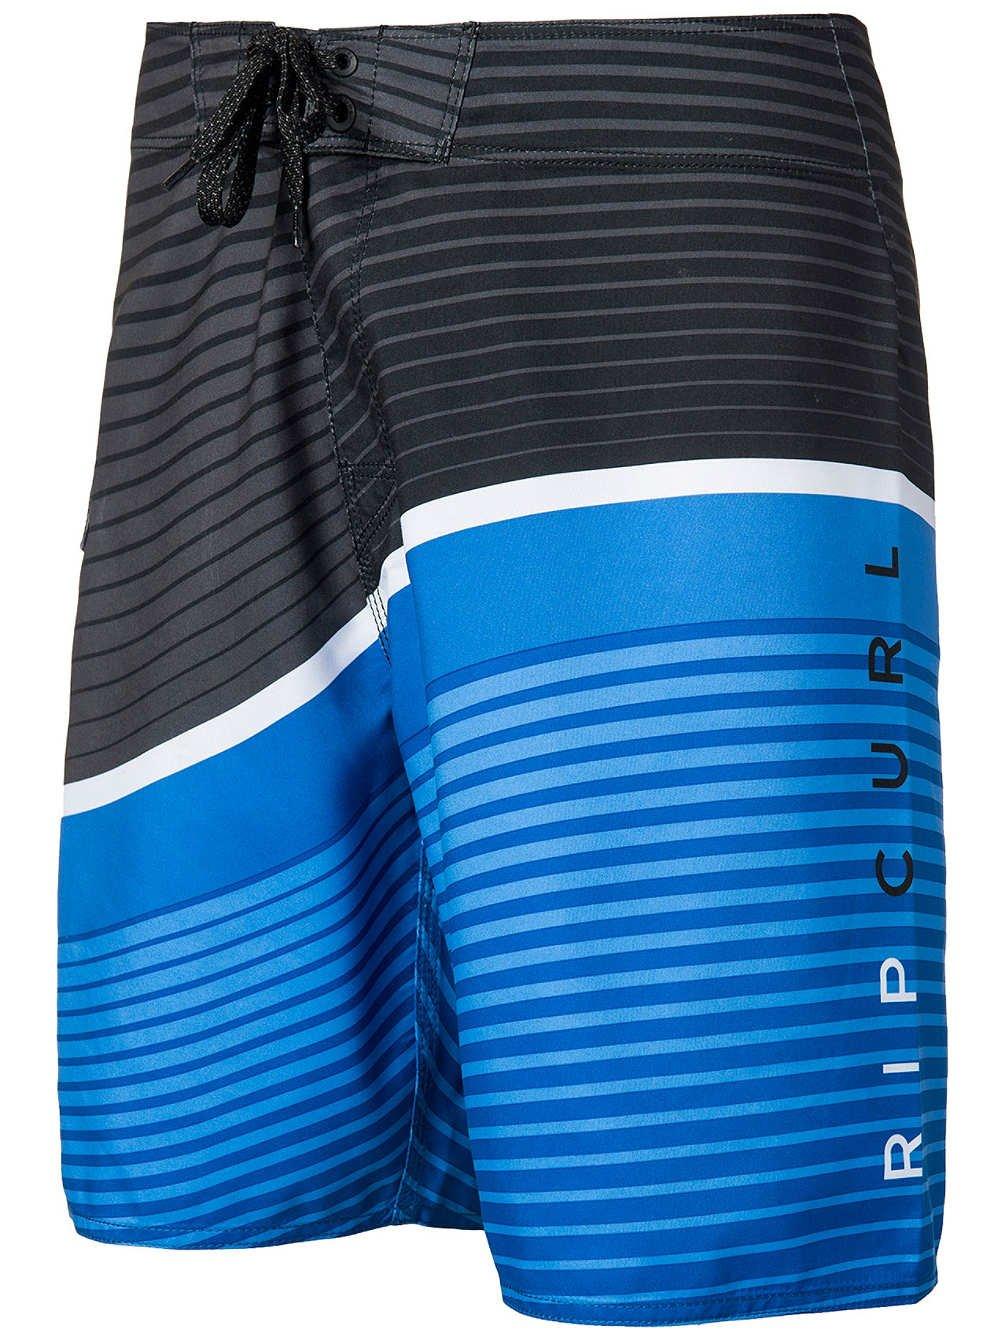 "RIP CURL Herren Boardshorts Floater 20"" Boardshorts"